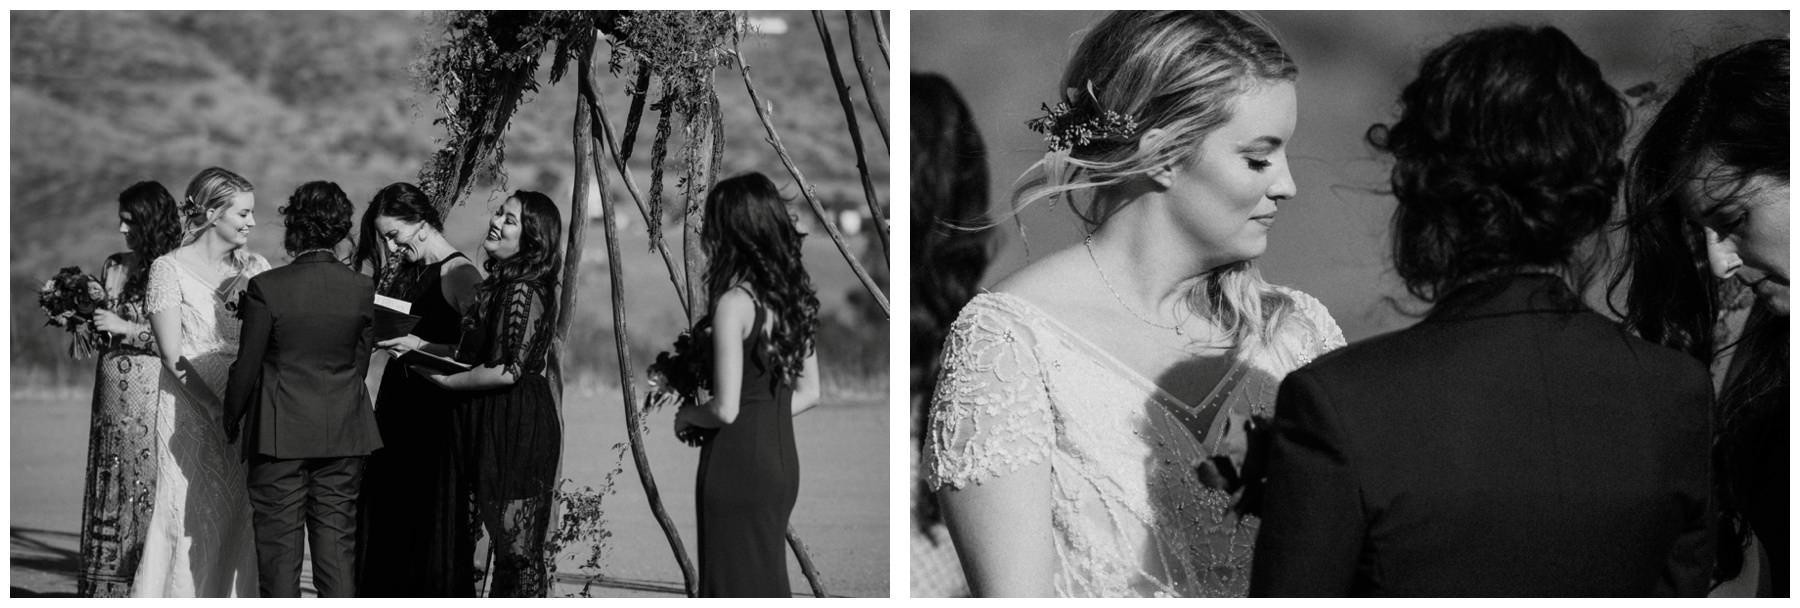 Temecula_Wedding_photographers_Wolf_Feather_Honey_0041.jpg